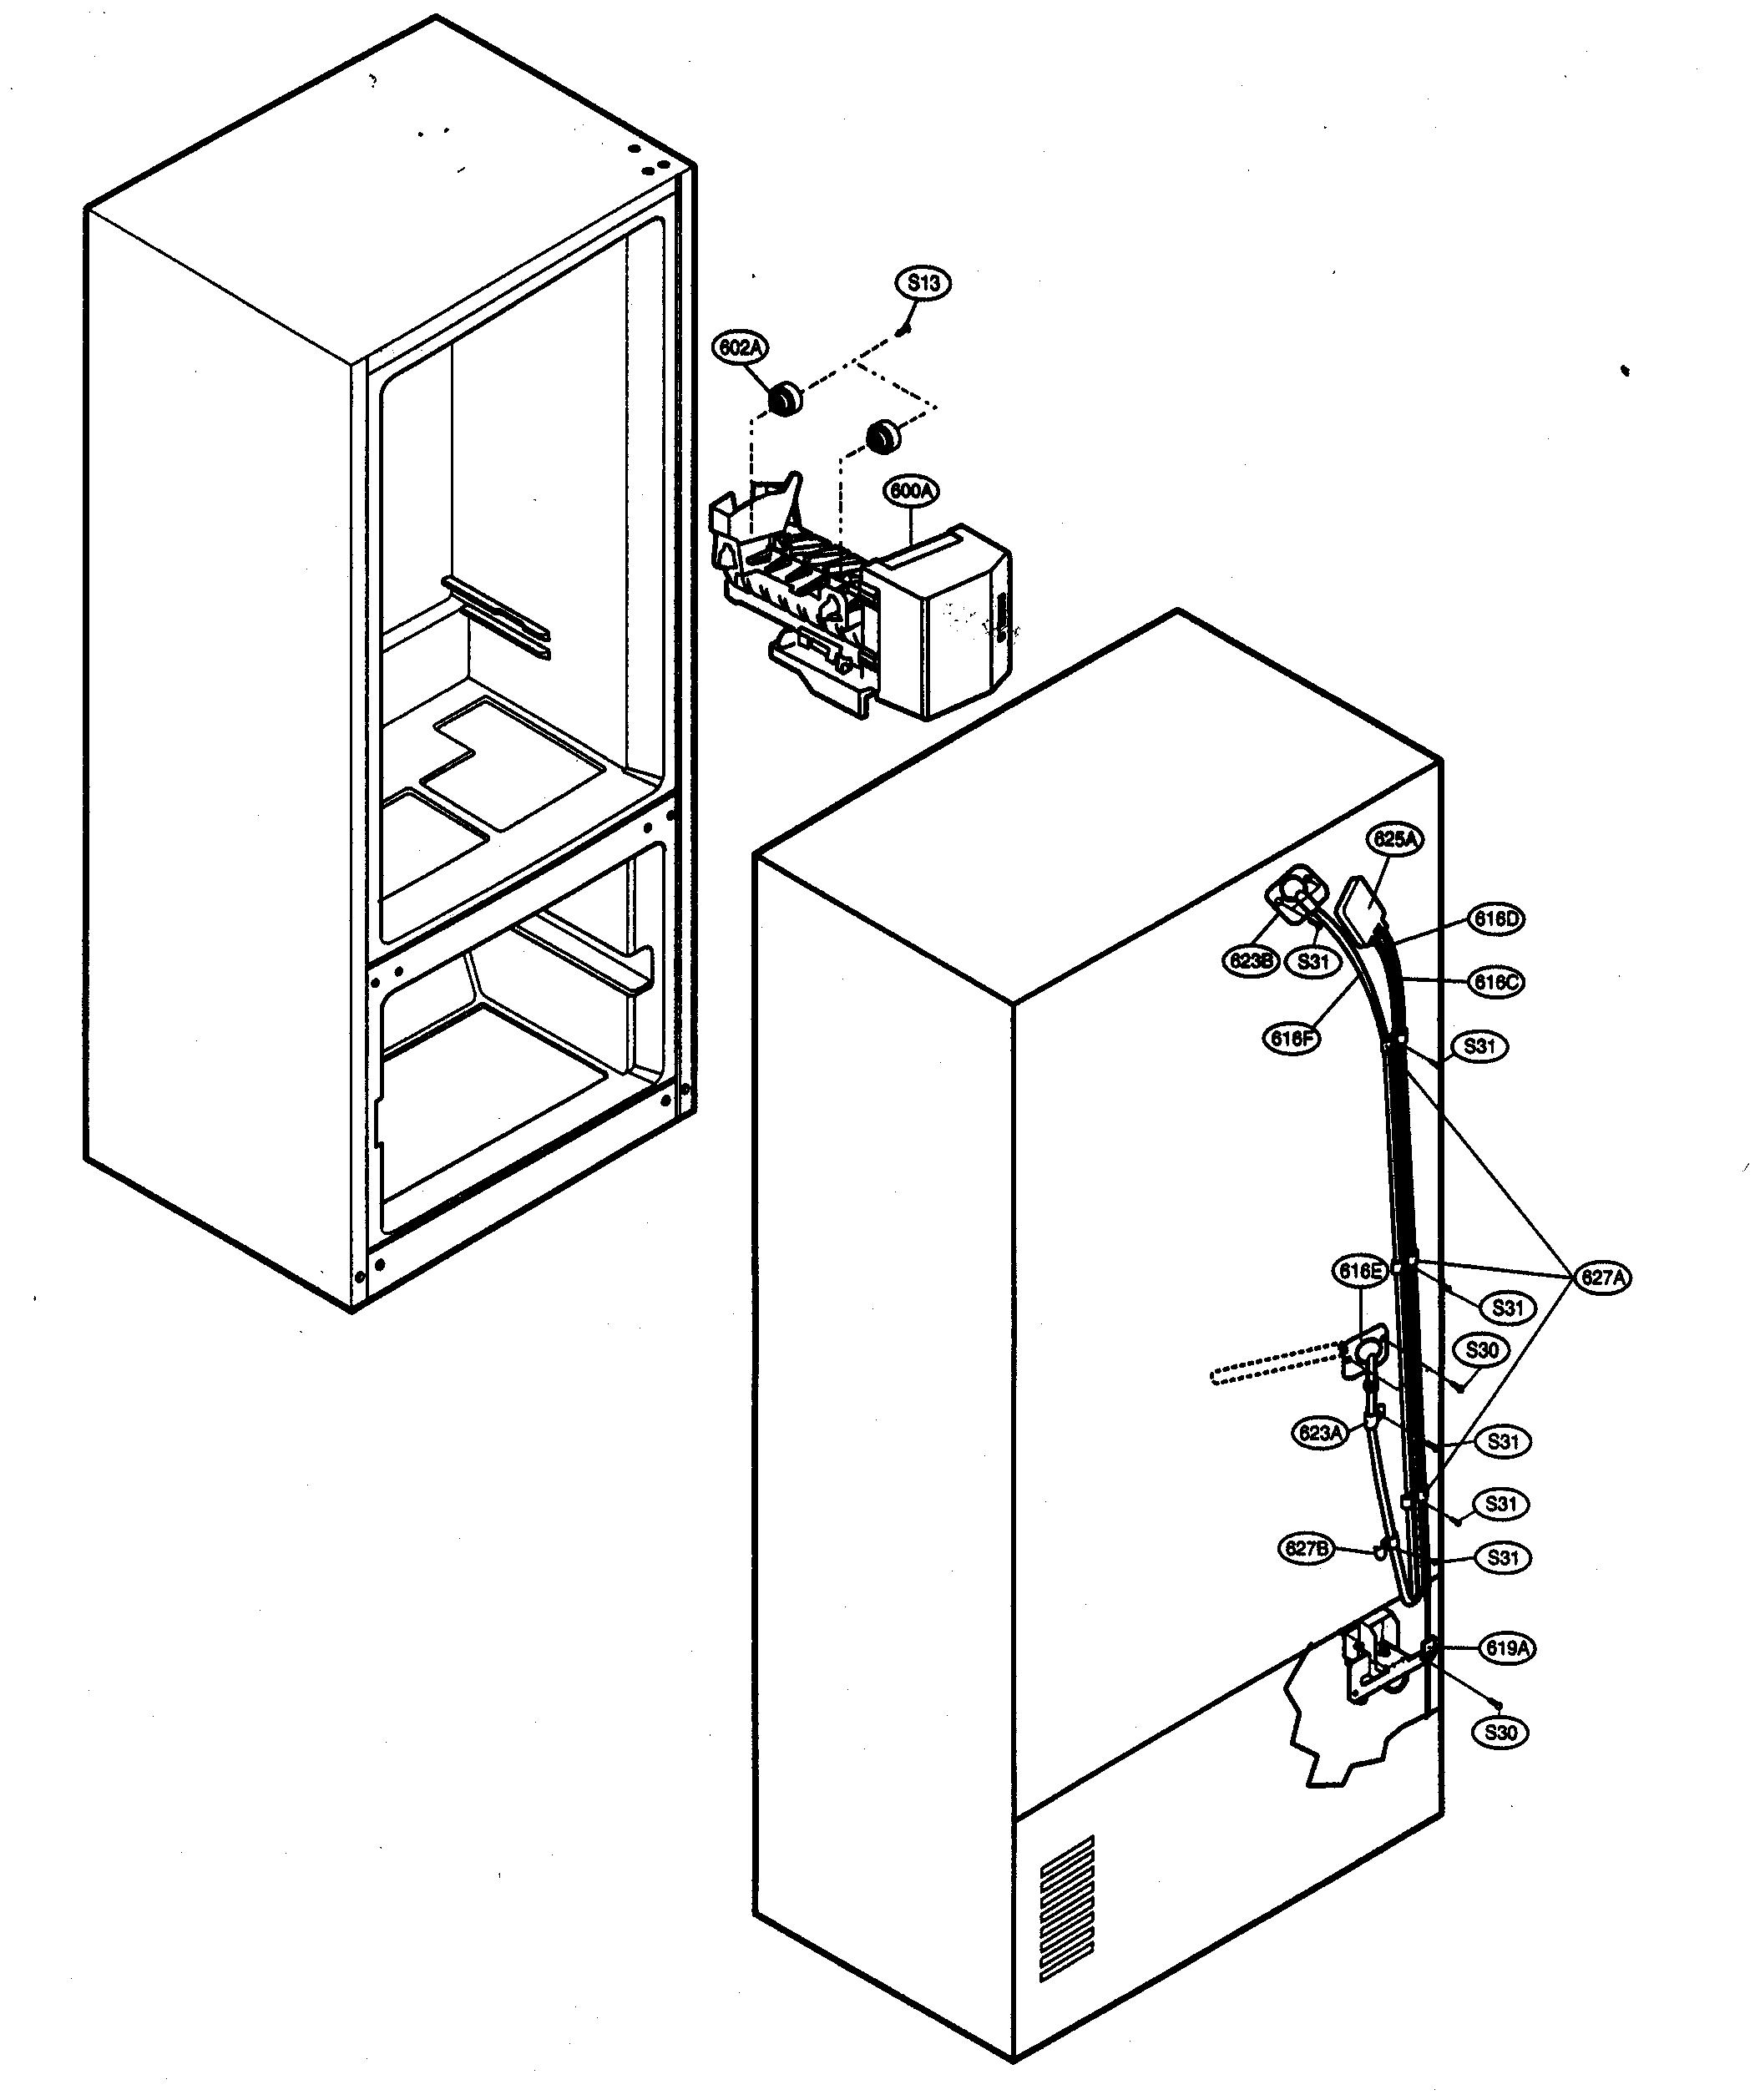 Wiring Diagram For Refrigerator